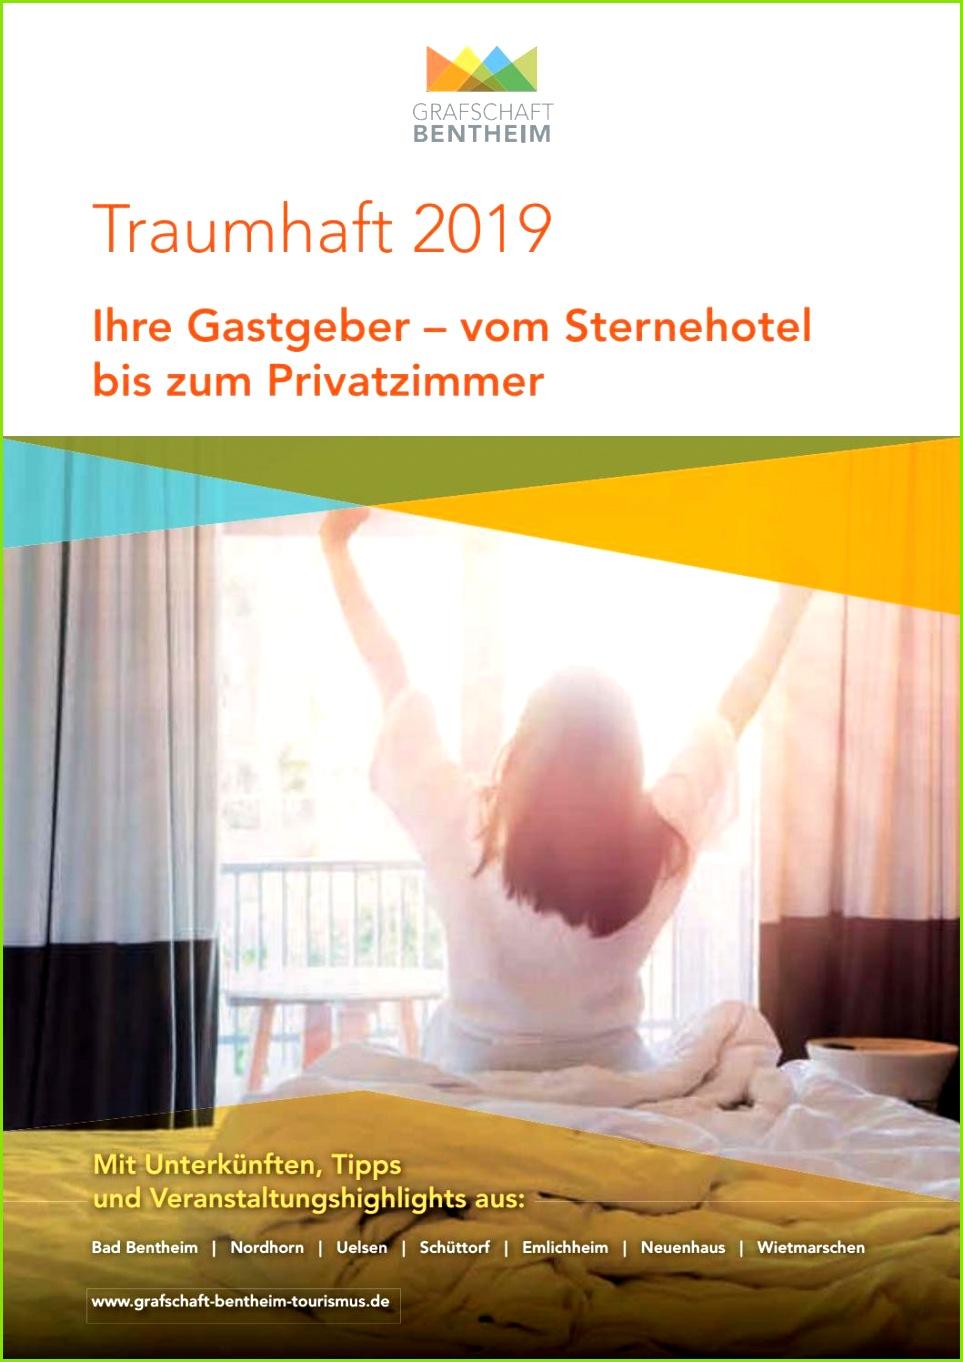 Gasgberverichnis 2019 der Grafschaft Bentheim by Grafschaft Bentheim issuu